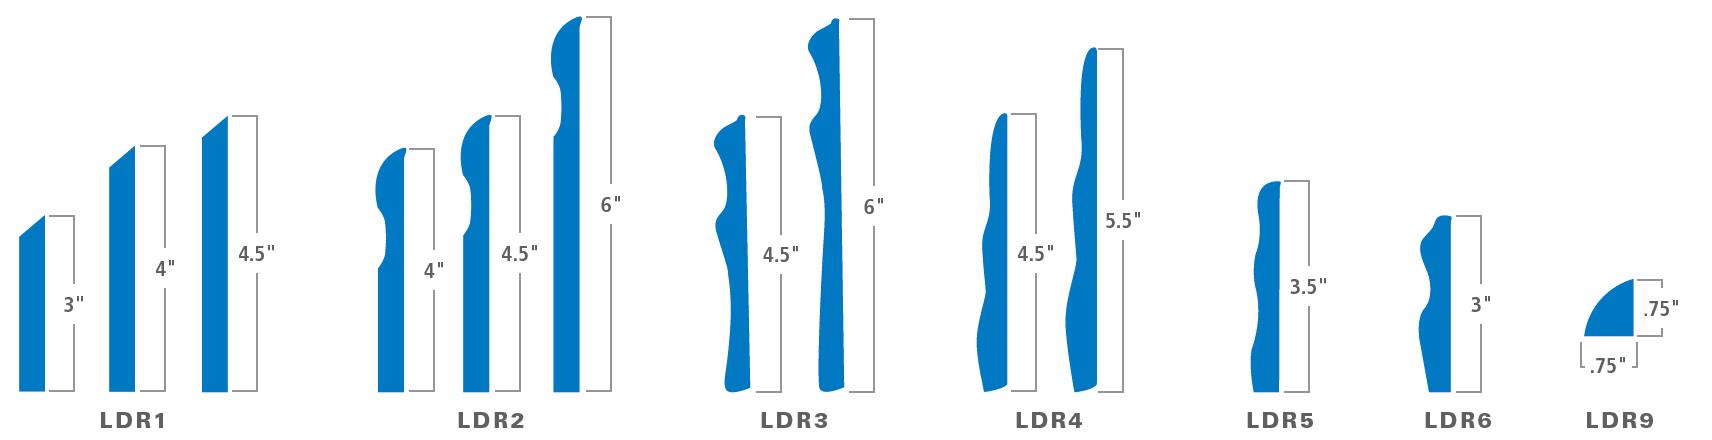 LDR Profiles